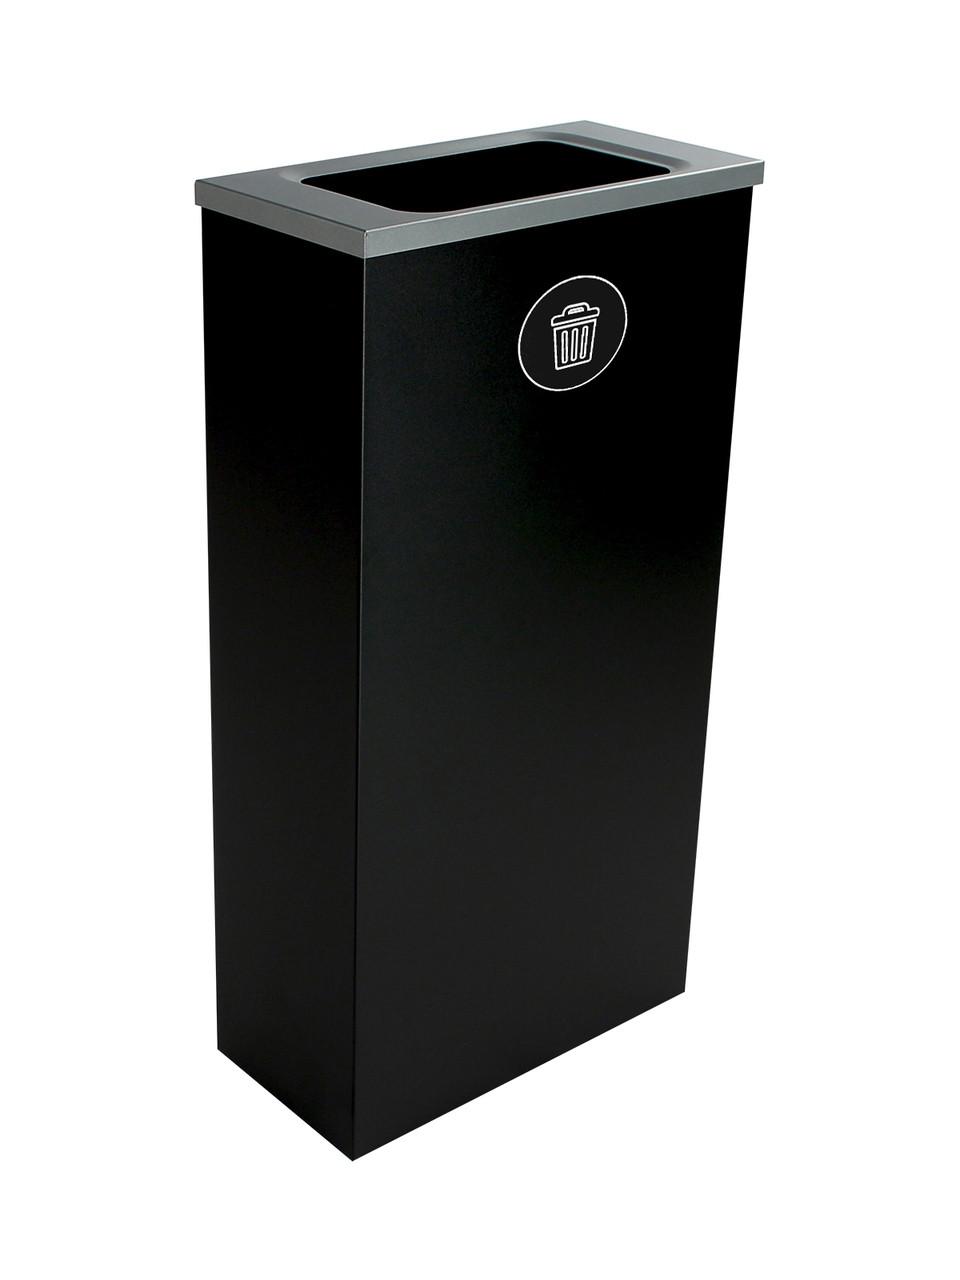 10 Gallon Steel Spectrum Slim Trash Can Black  8107067-4